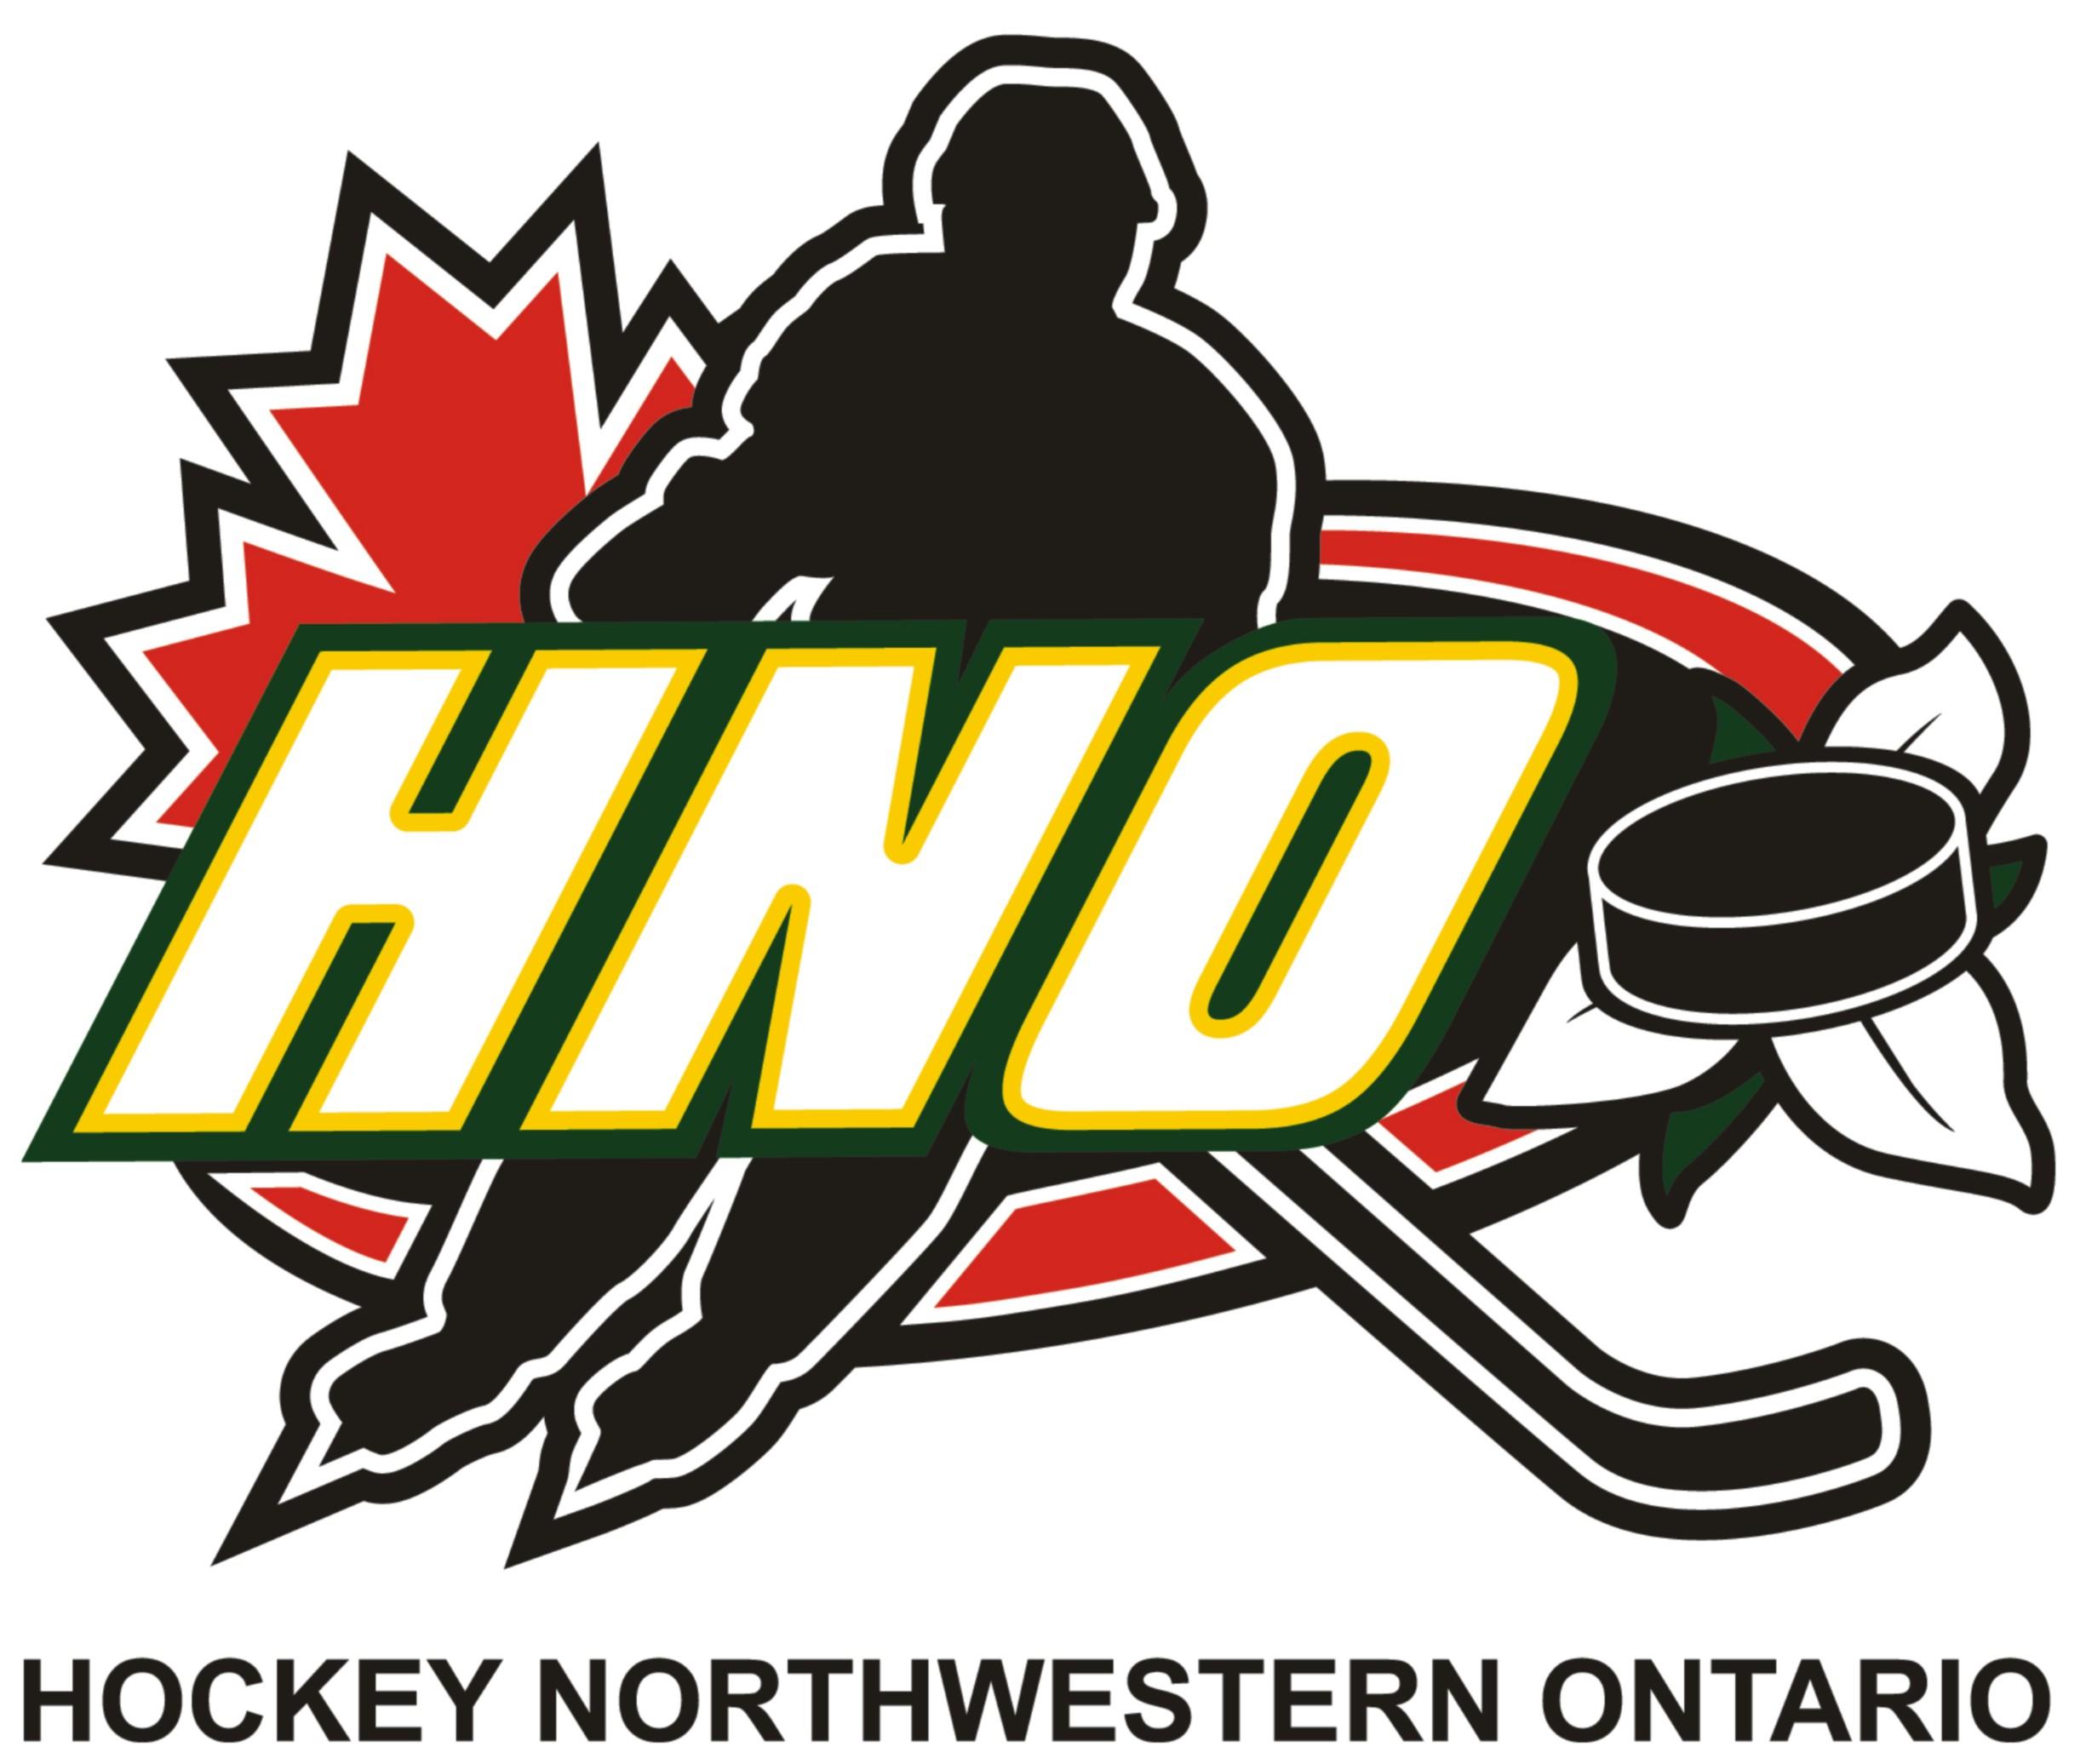 Hockey Northwestern Ontario